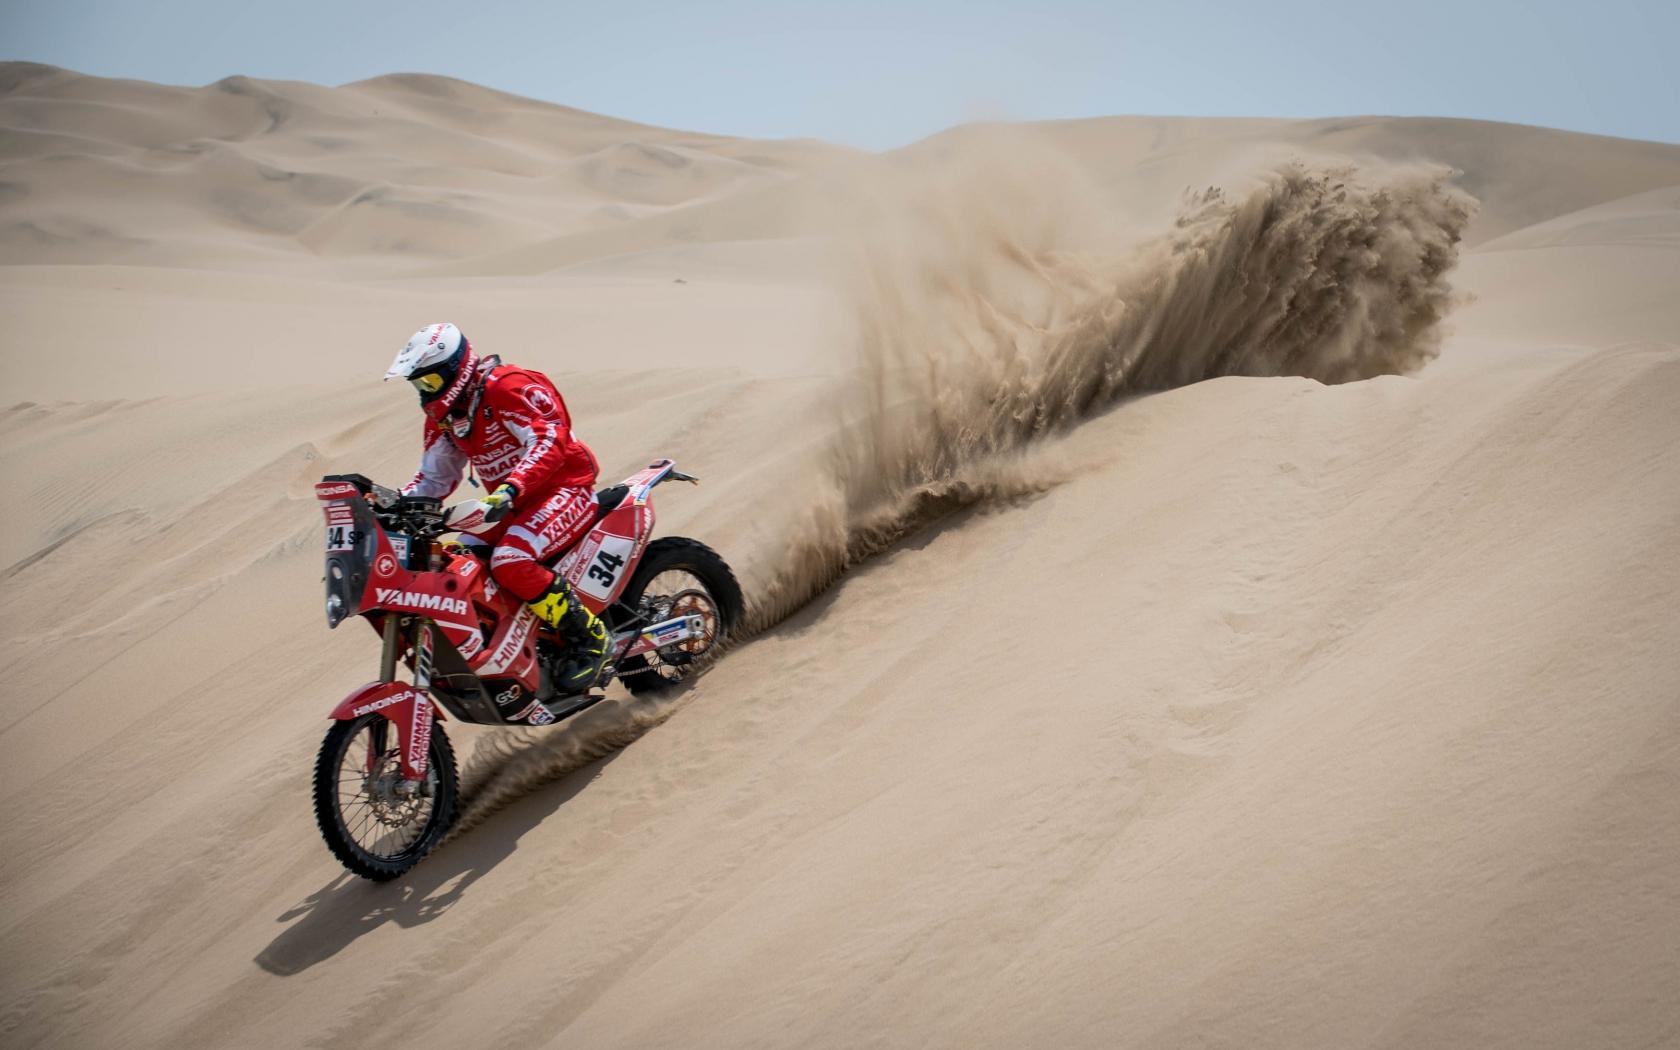 Marc Sola - Dakar 2018 - 1680x1050